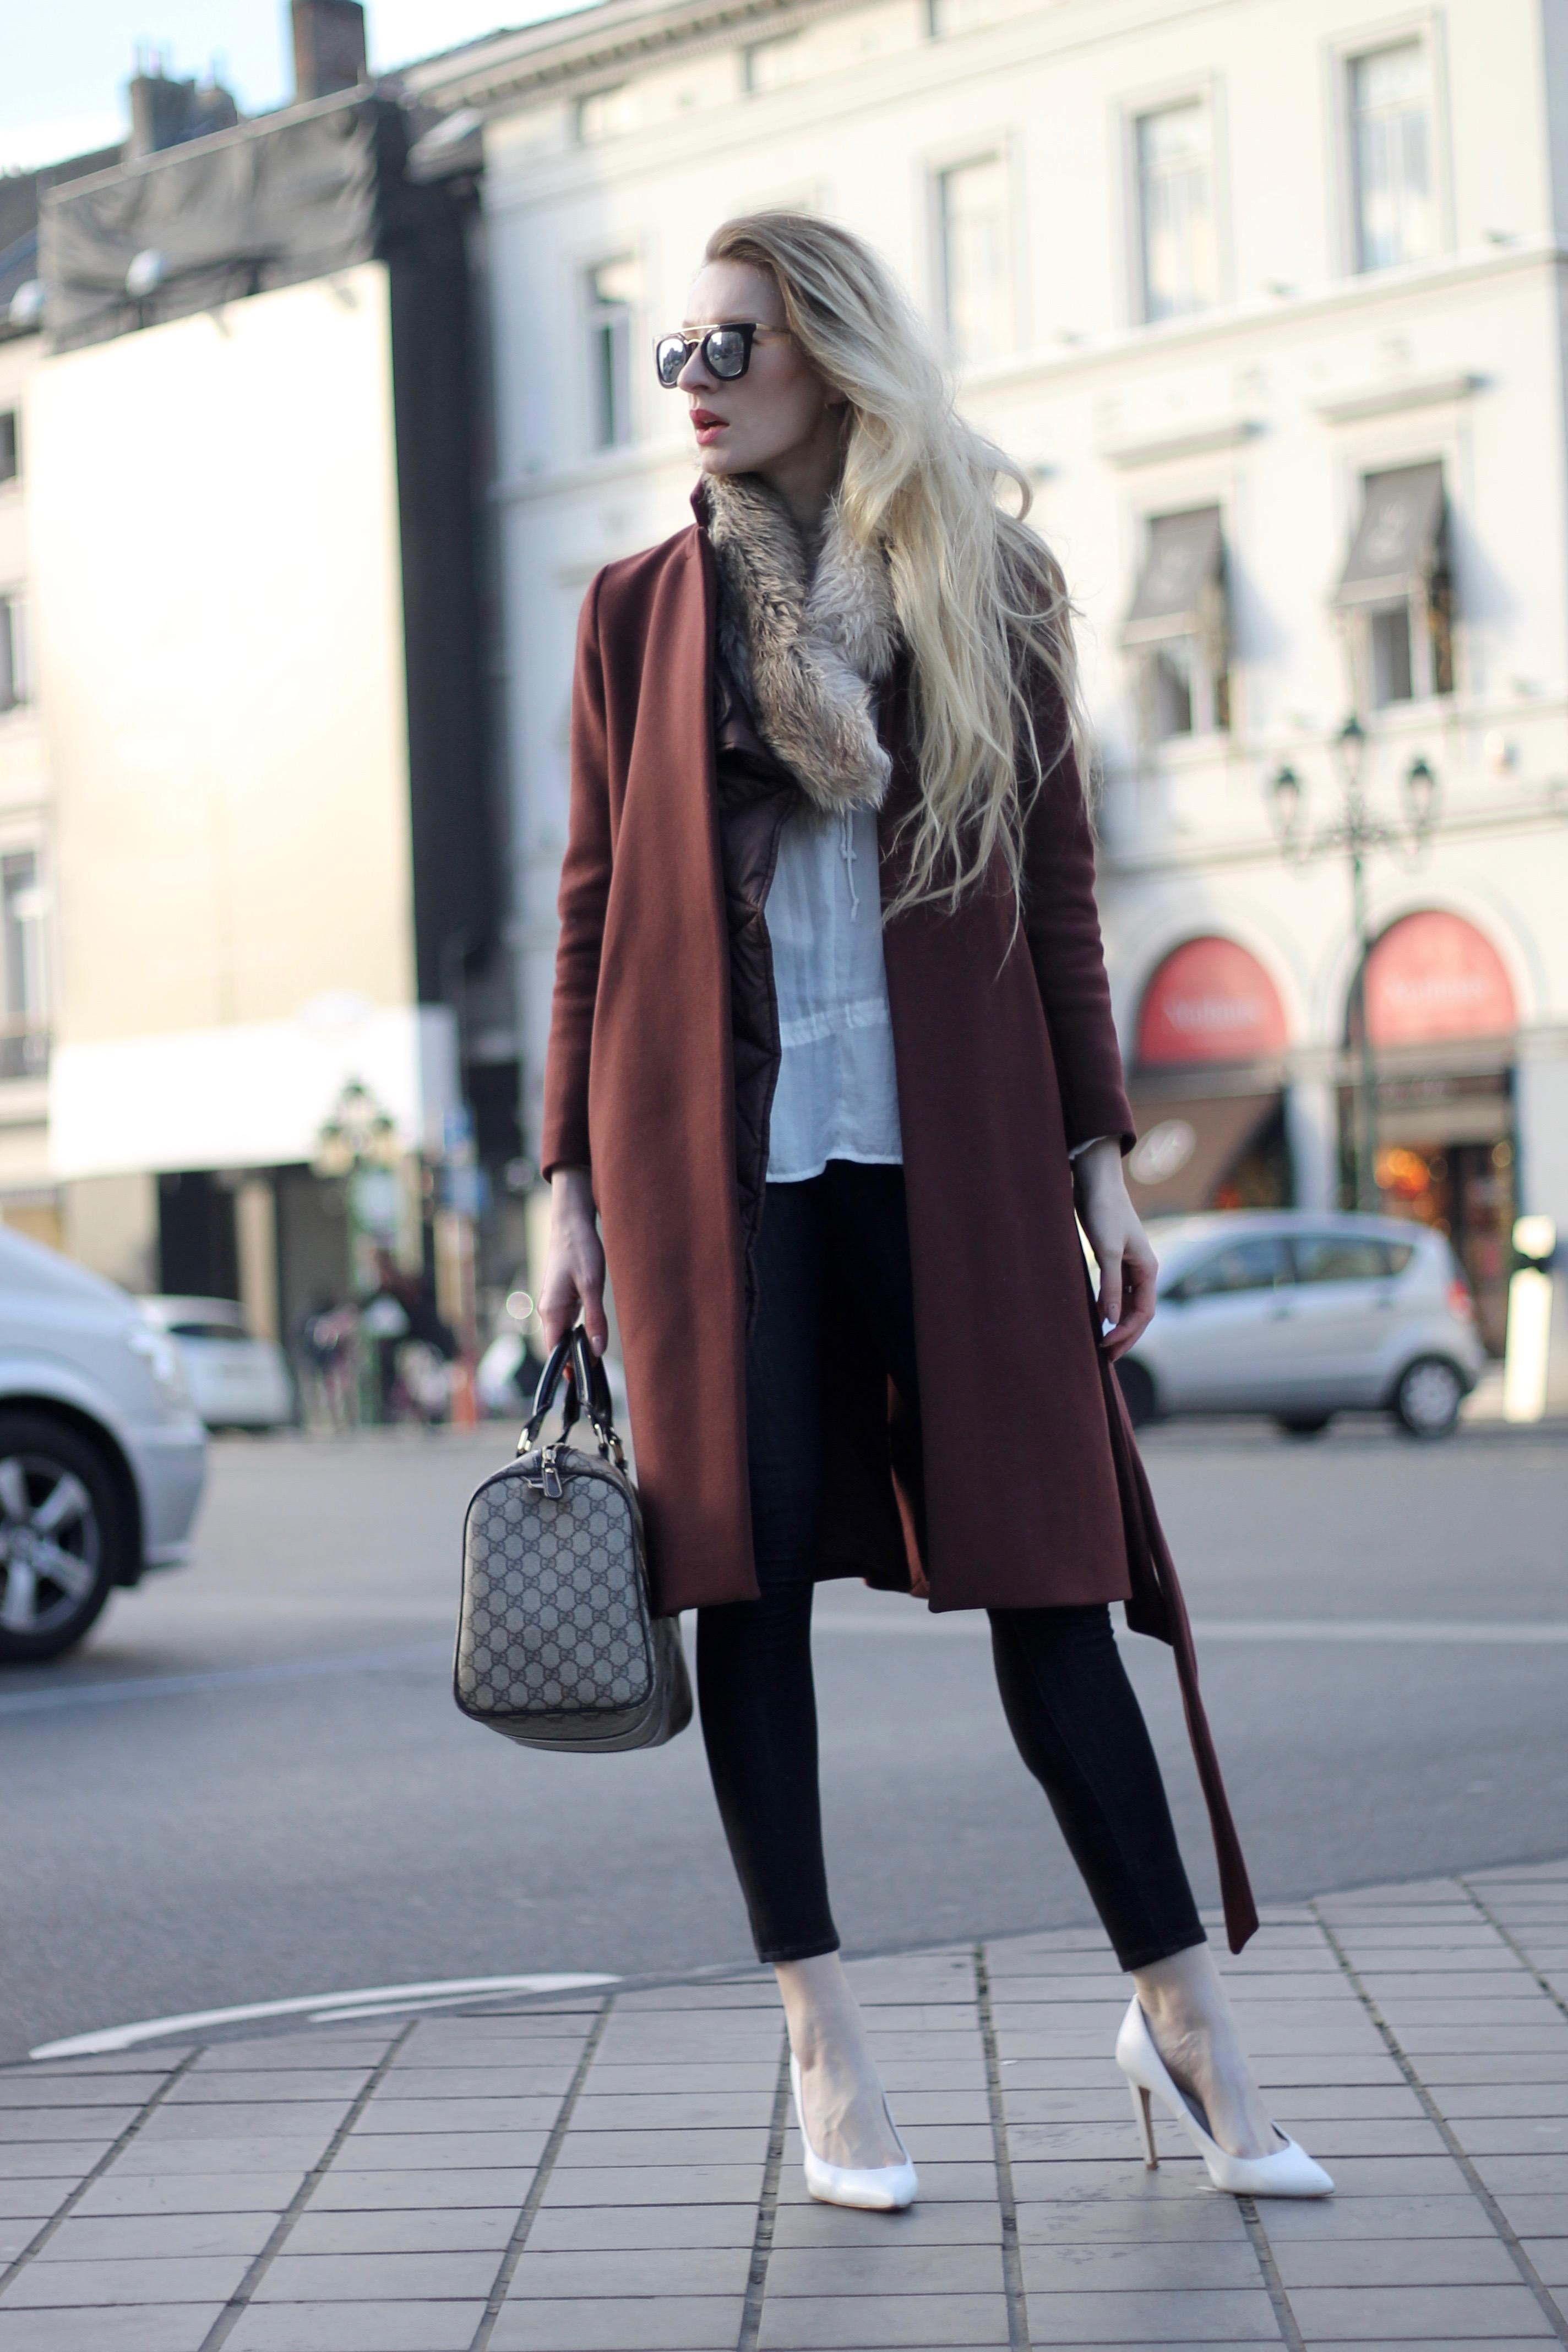 MON MODE | Fashion Blogger | Berlin Street Style | Fashion Trends | Berlin Fashion| Brussels| Travel Blogger| Belgium |Brussels